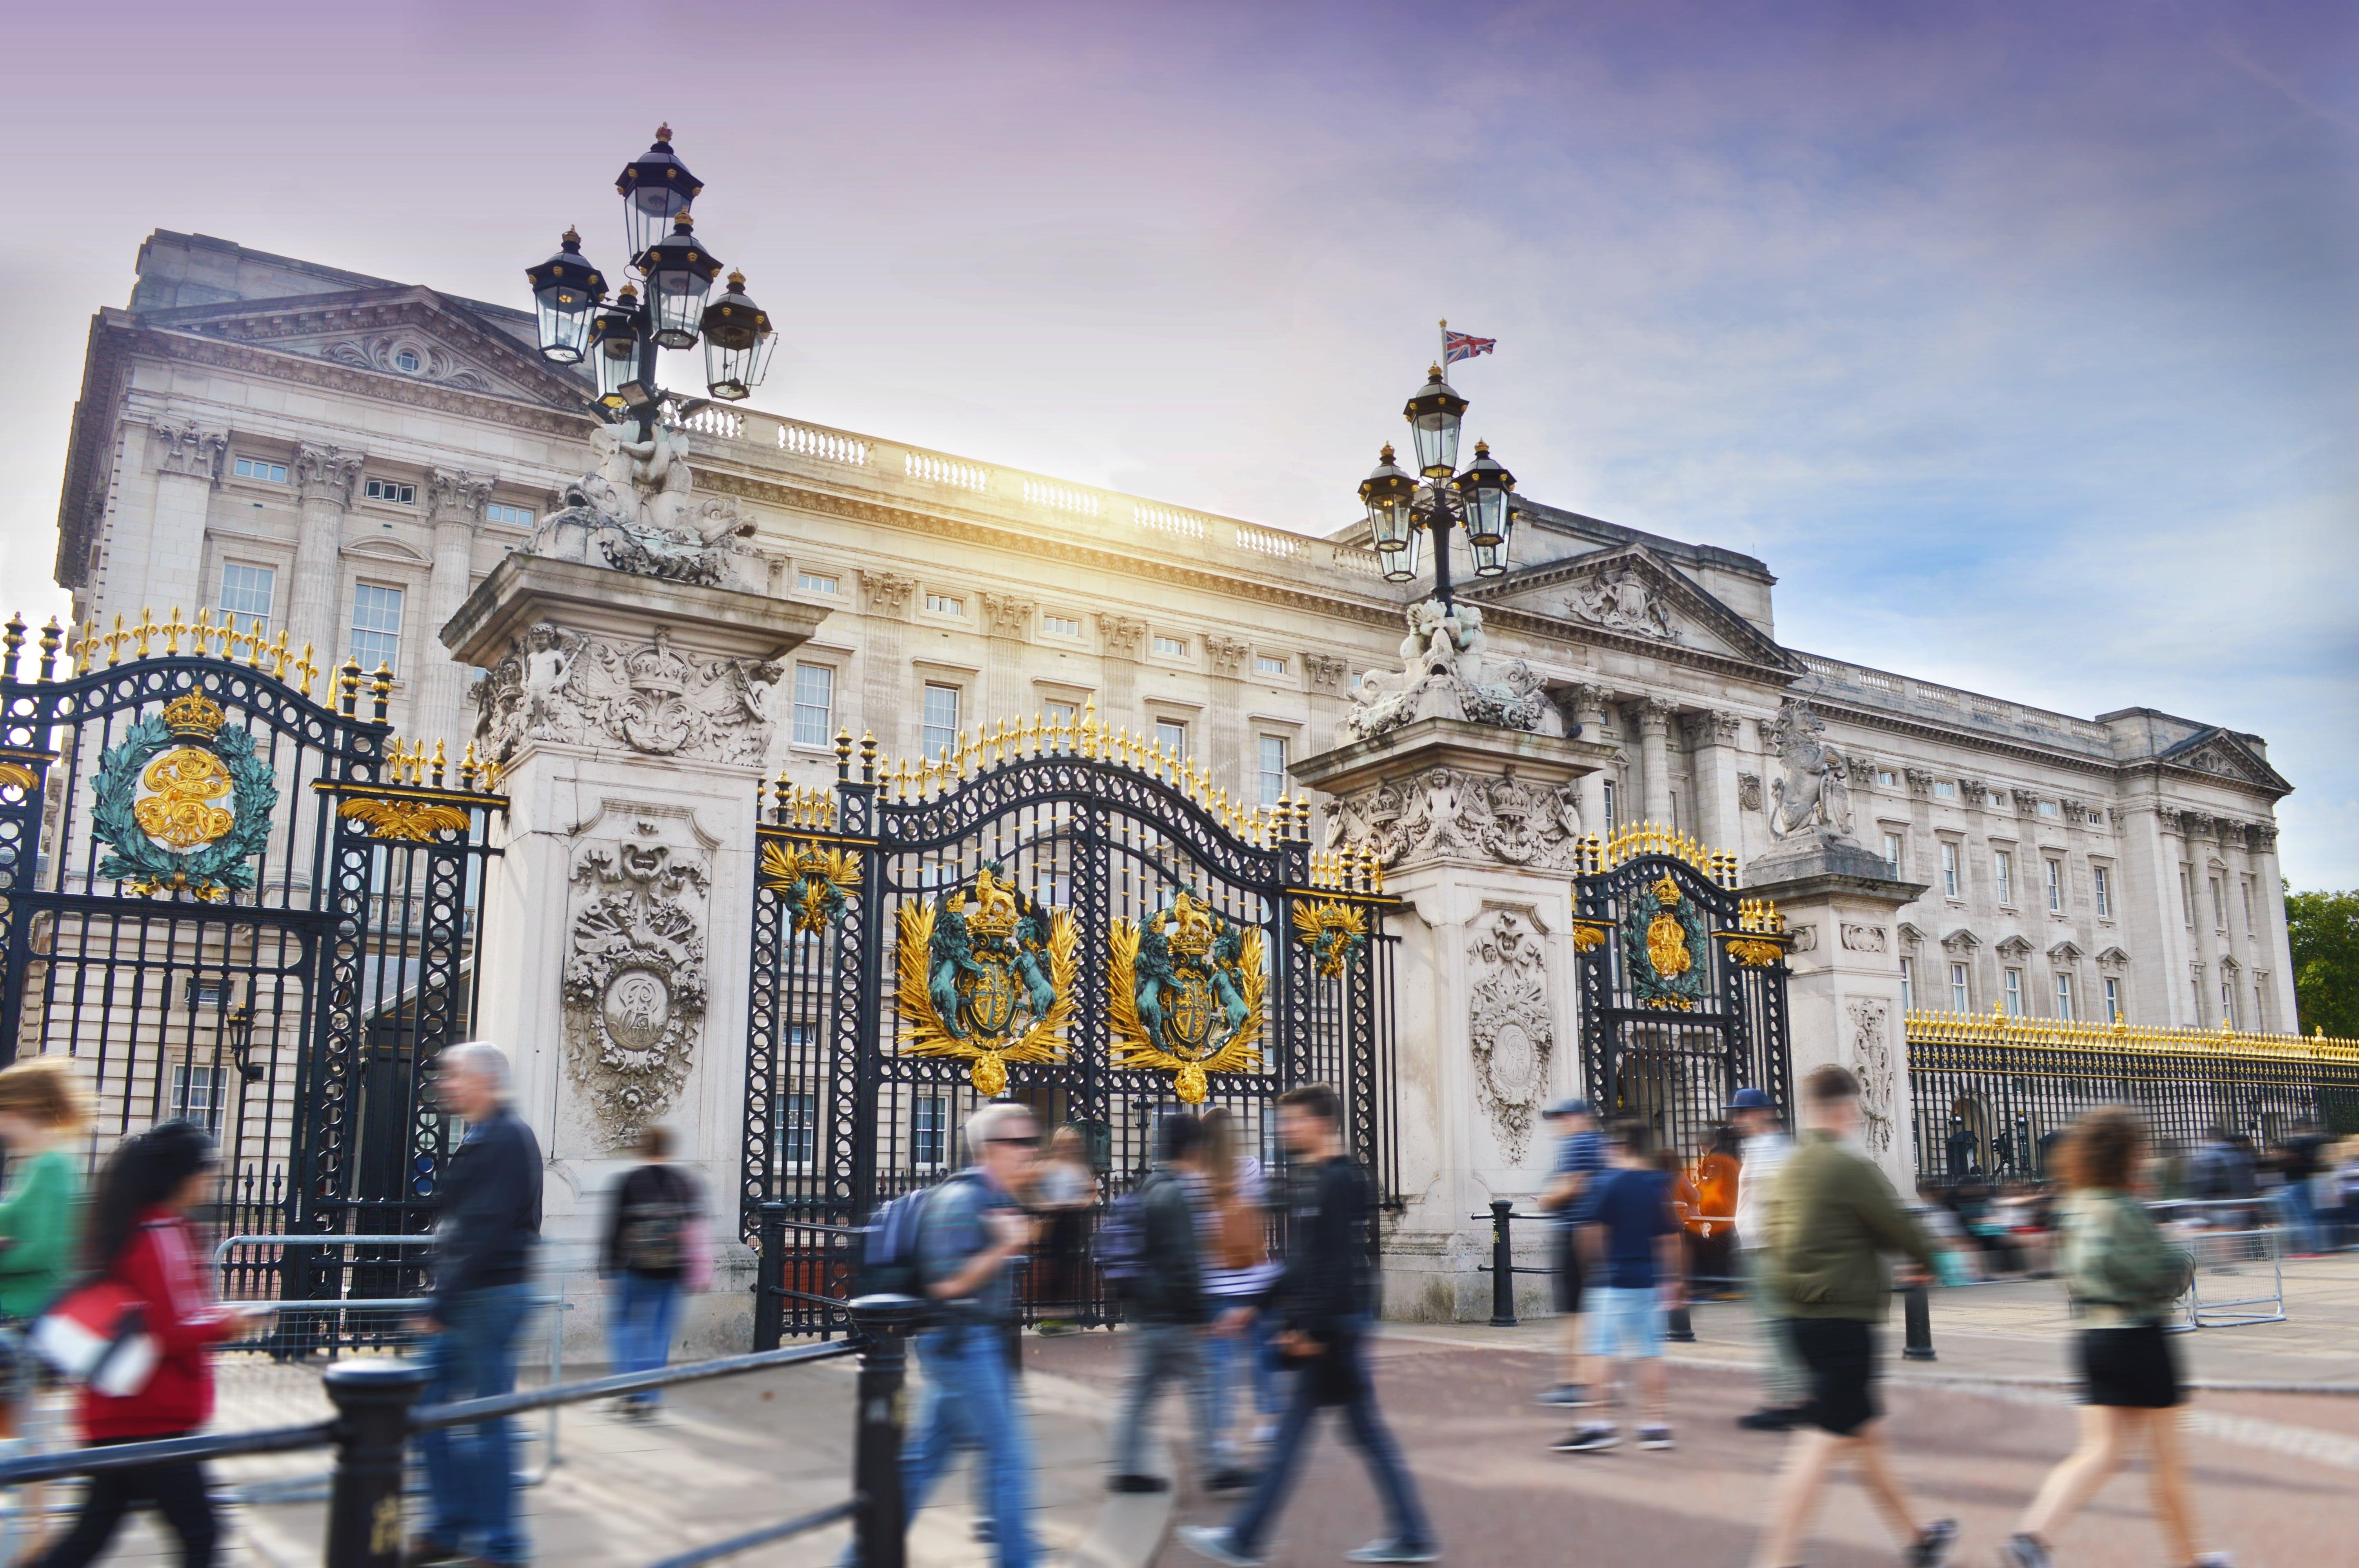 Buckingham Palace Accessibility